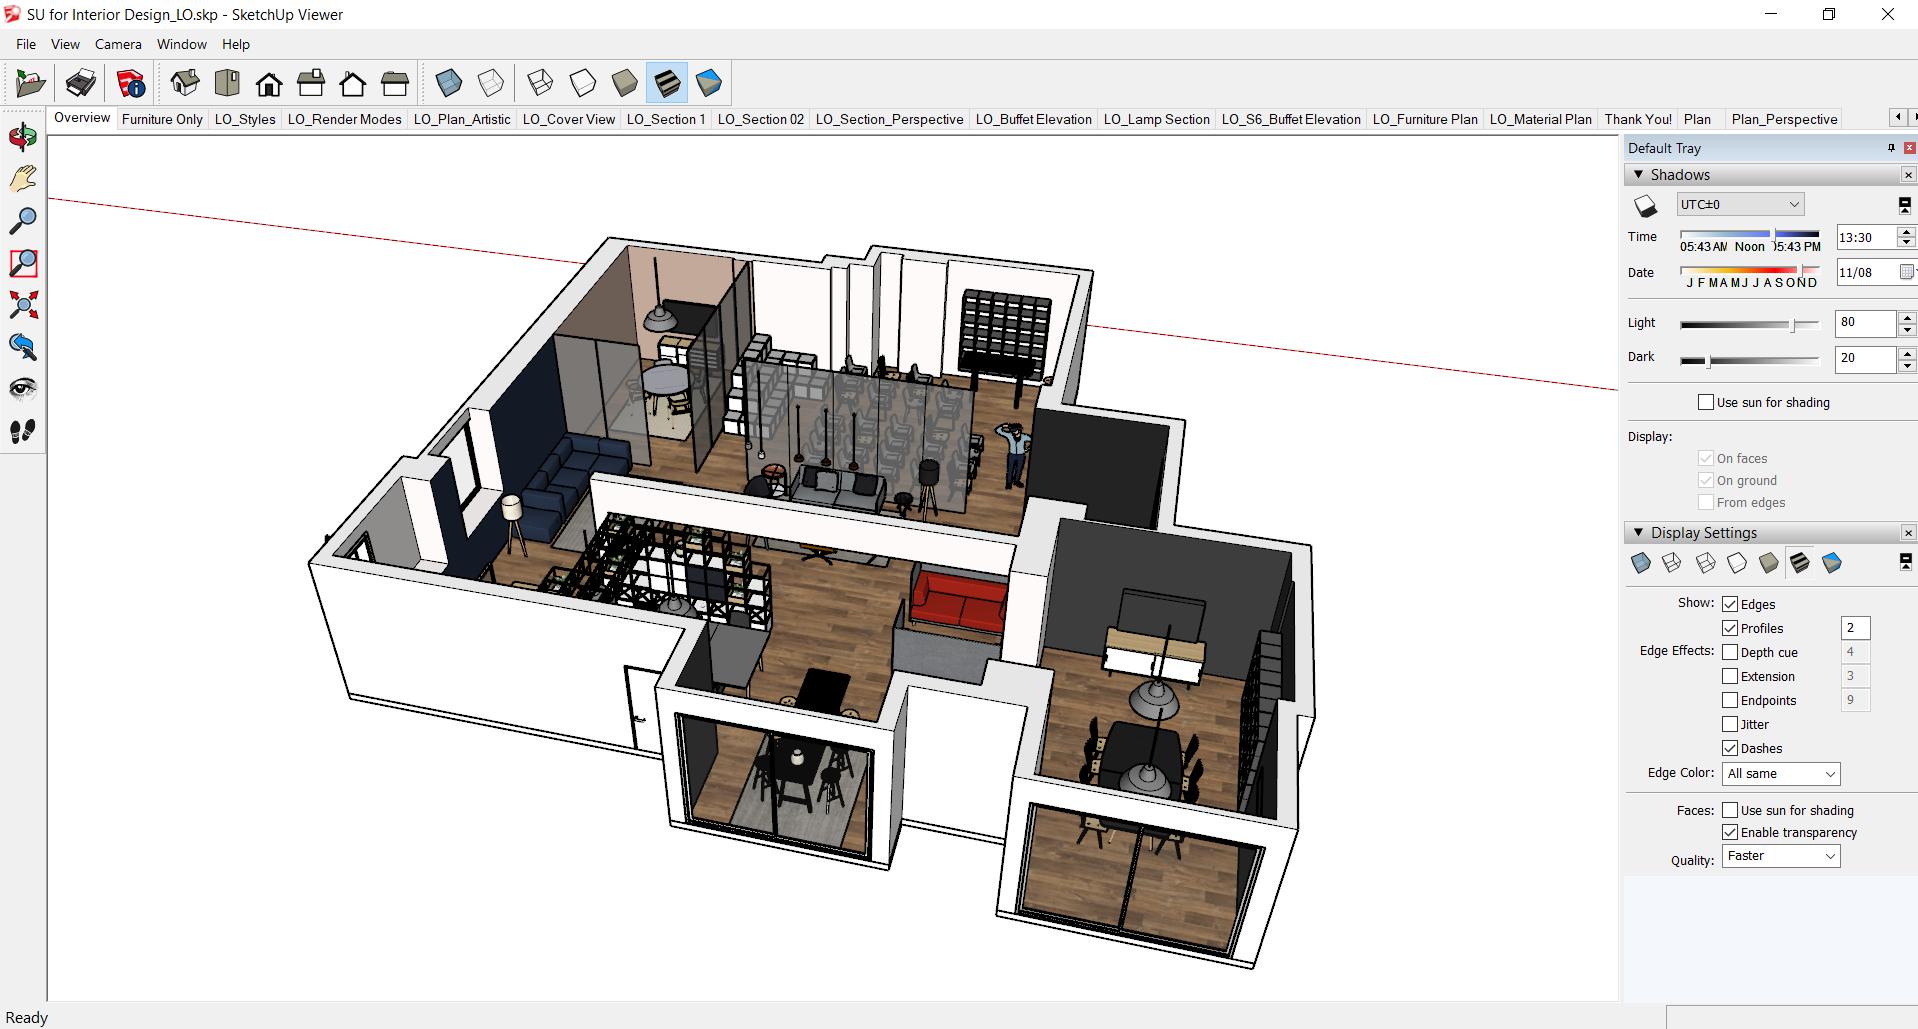 Prezentacja projektu w SketchUp Desktop Viewer.